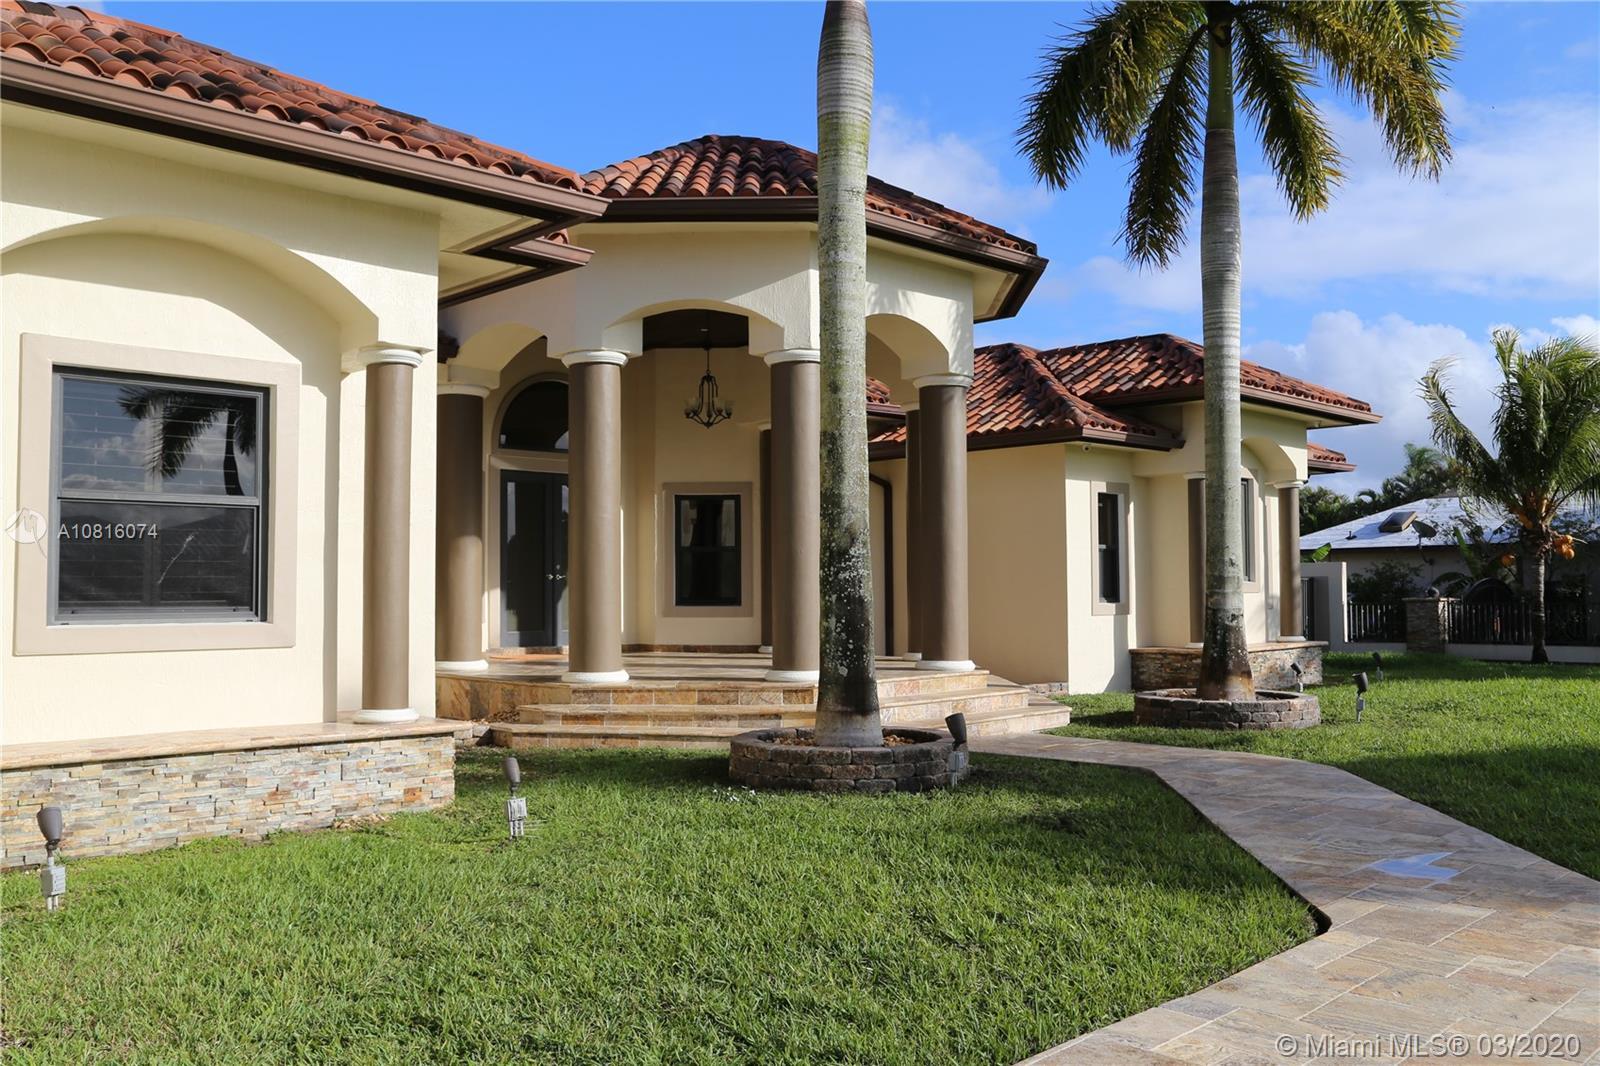 3551 SW 141st Ave, Miramar, FL 33027